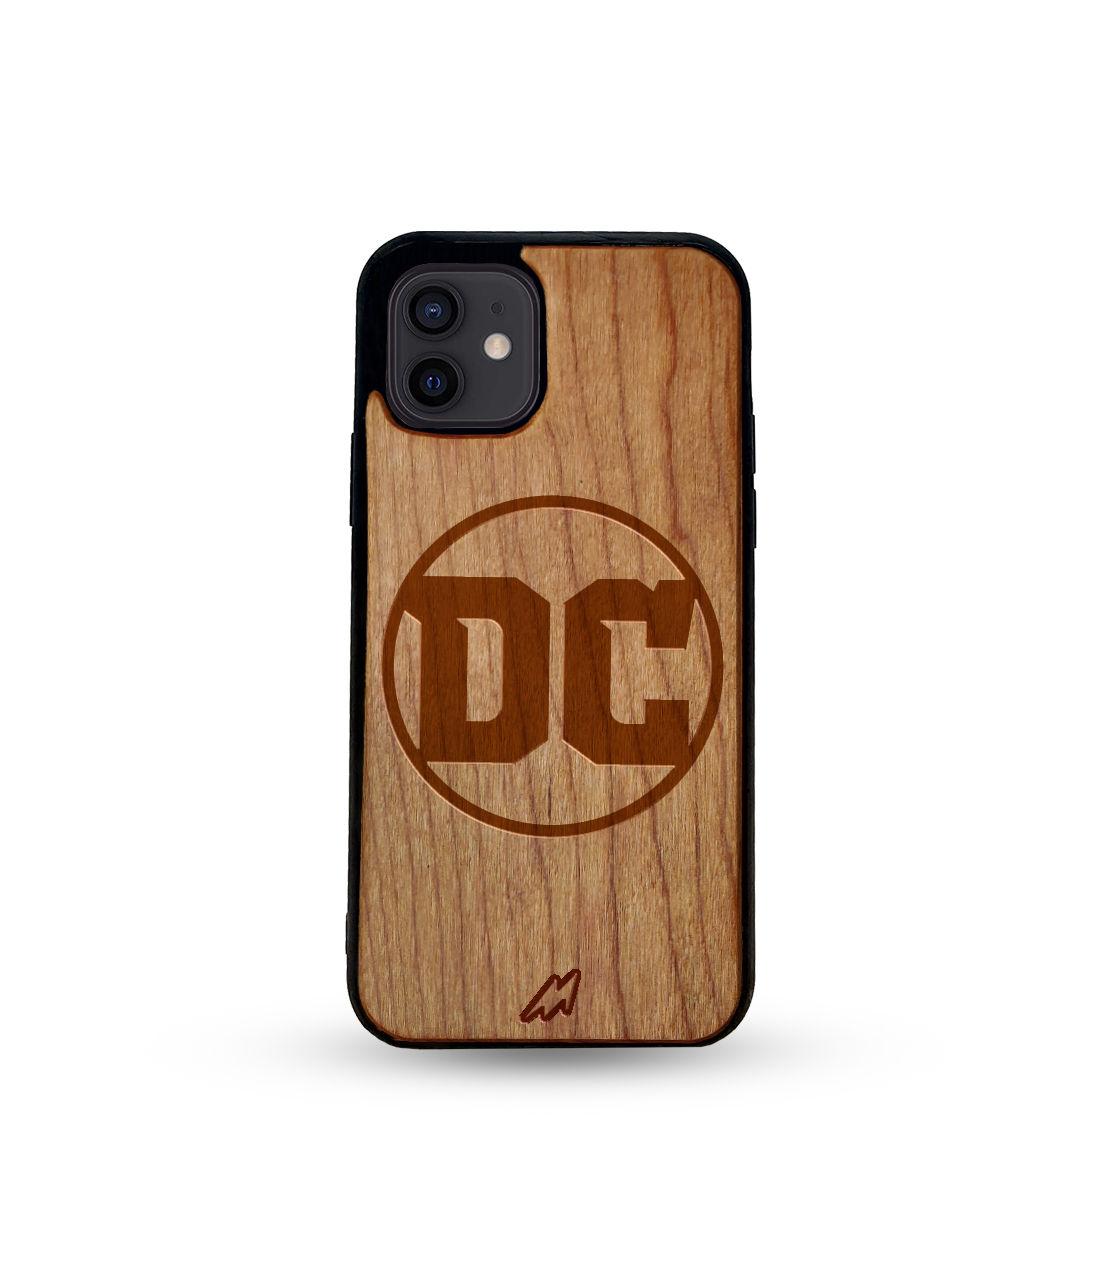 DC Comics - Honey Maple Wooden Phone Case for iPhone 12